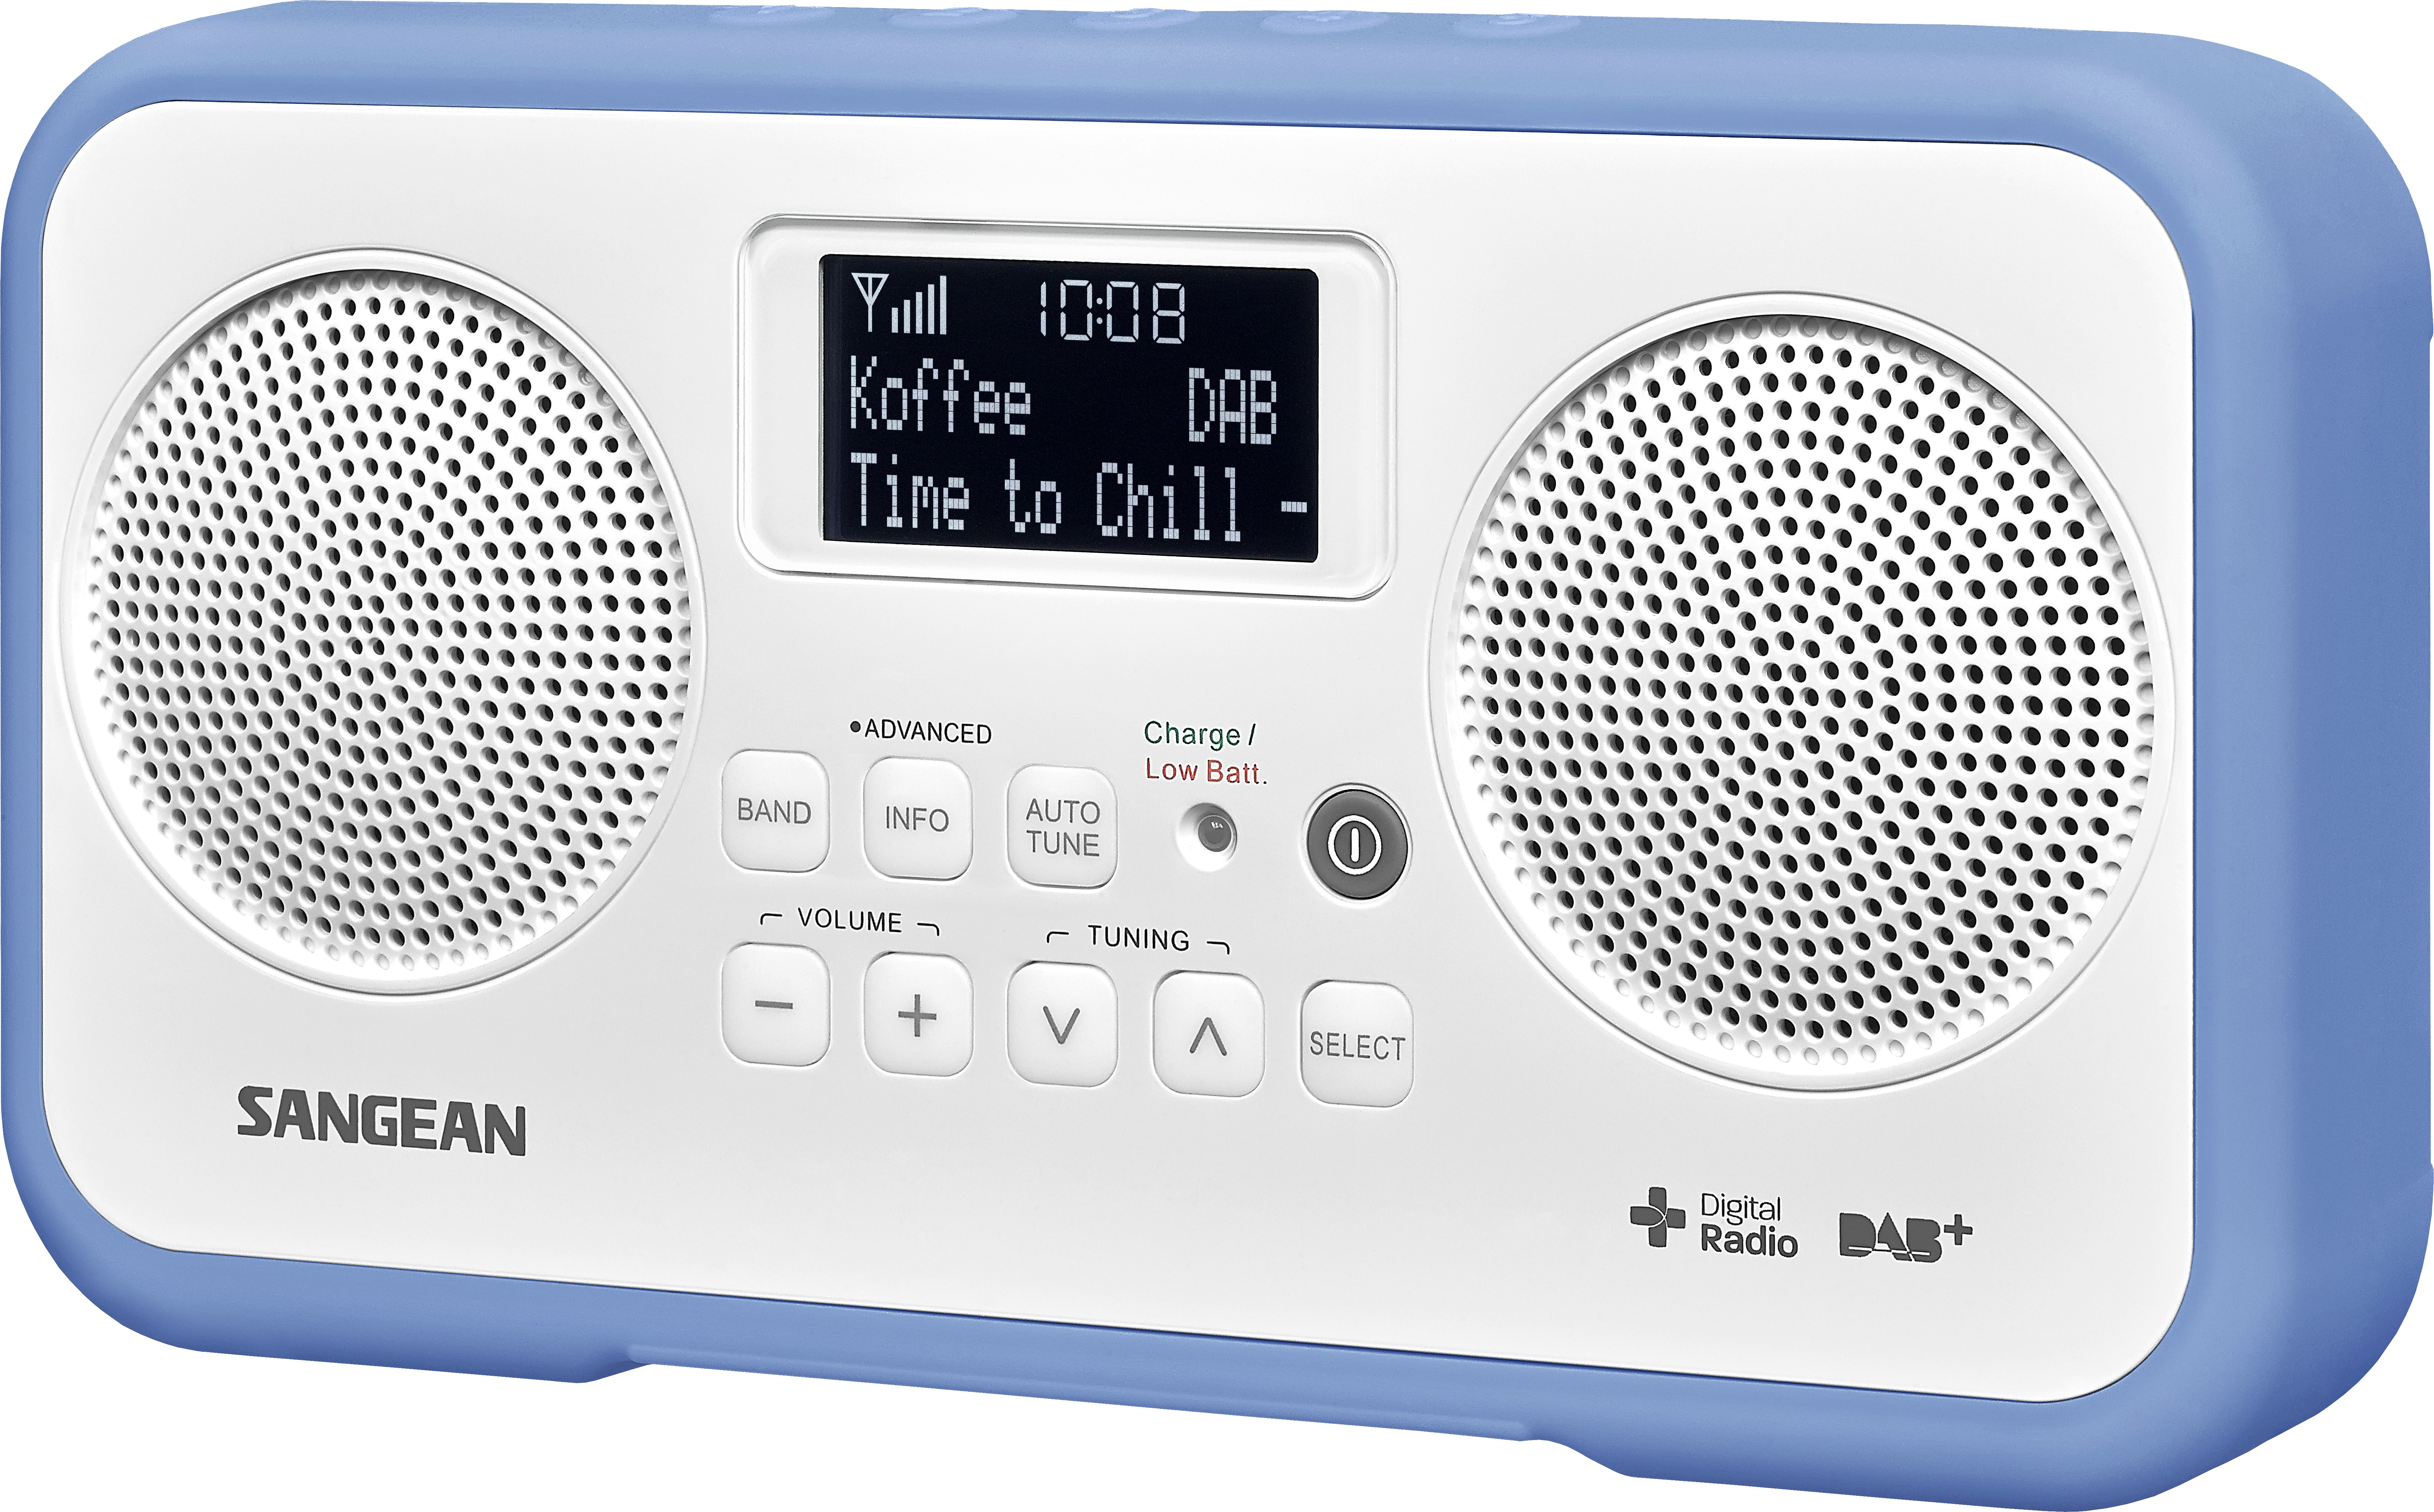 Sangean DPR 77 dab radio